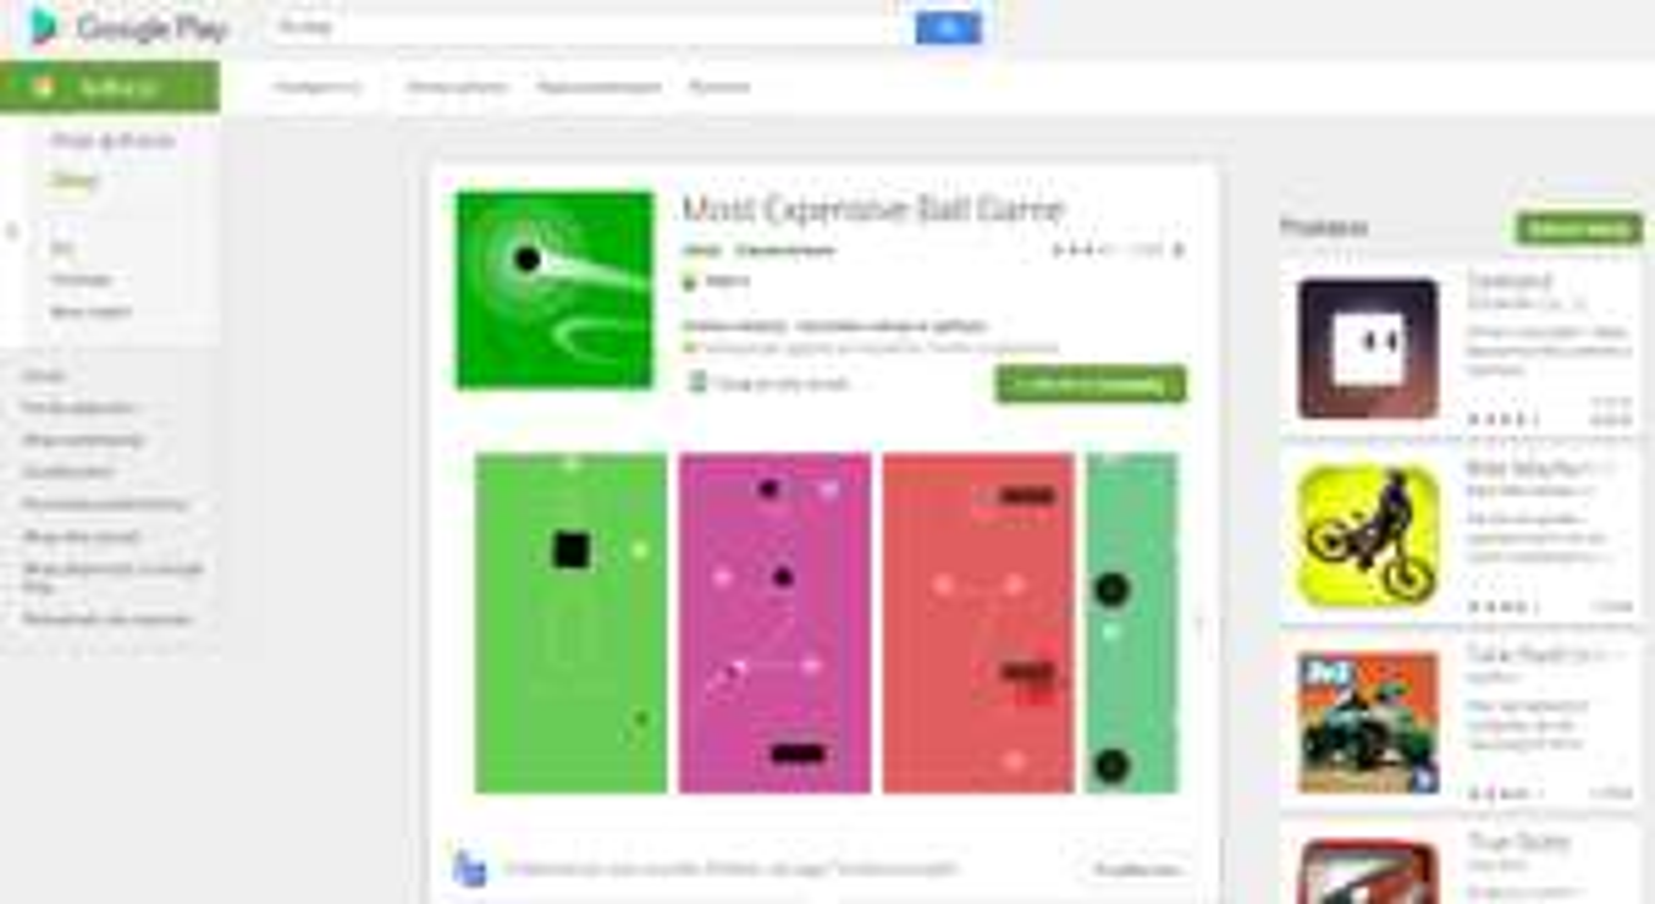 Most Expensive Ball Game,zręcznościówka w Google Play.